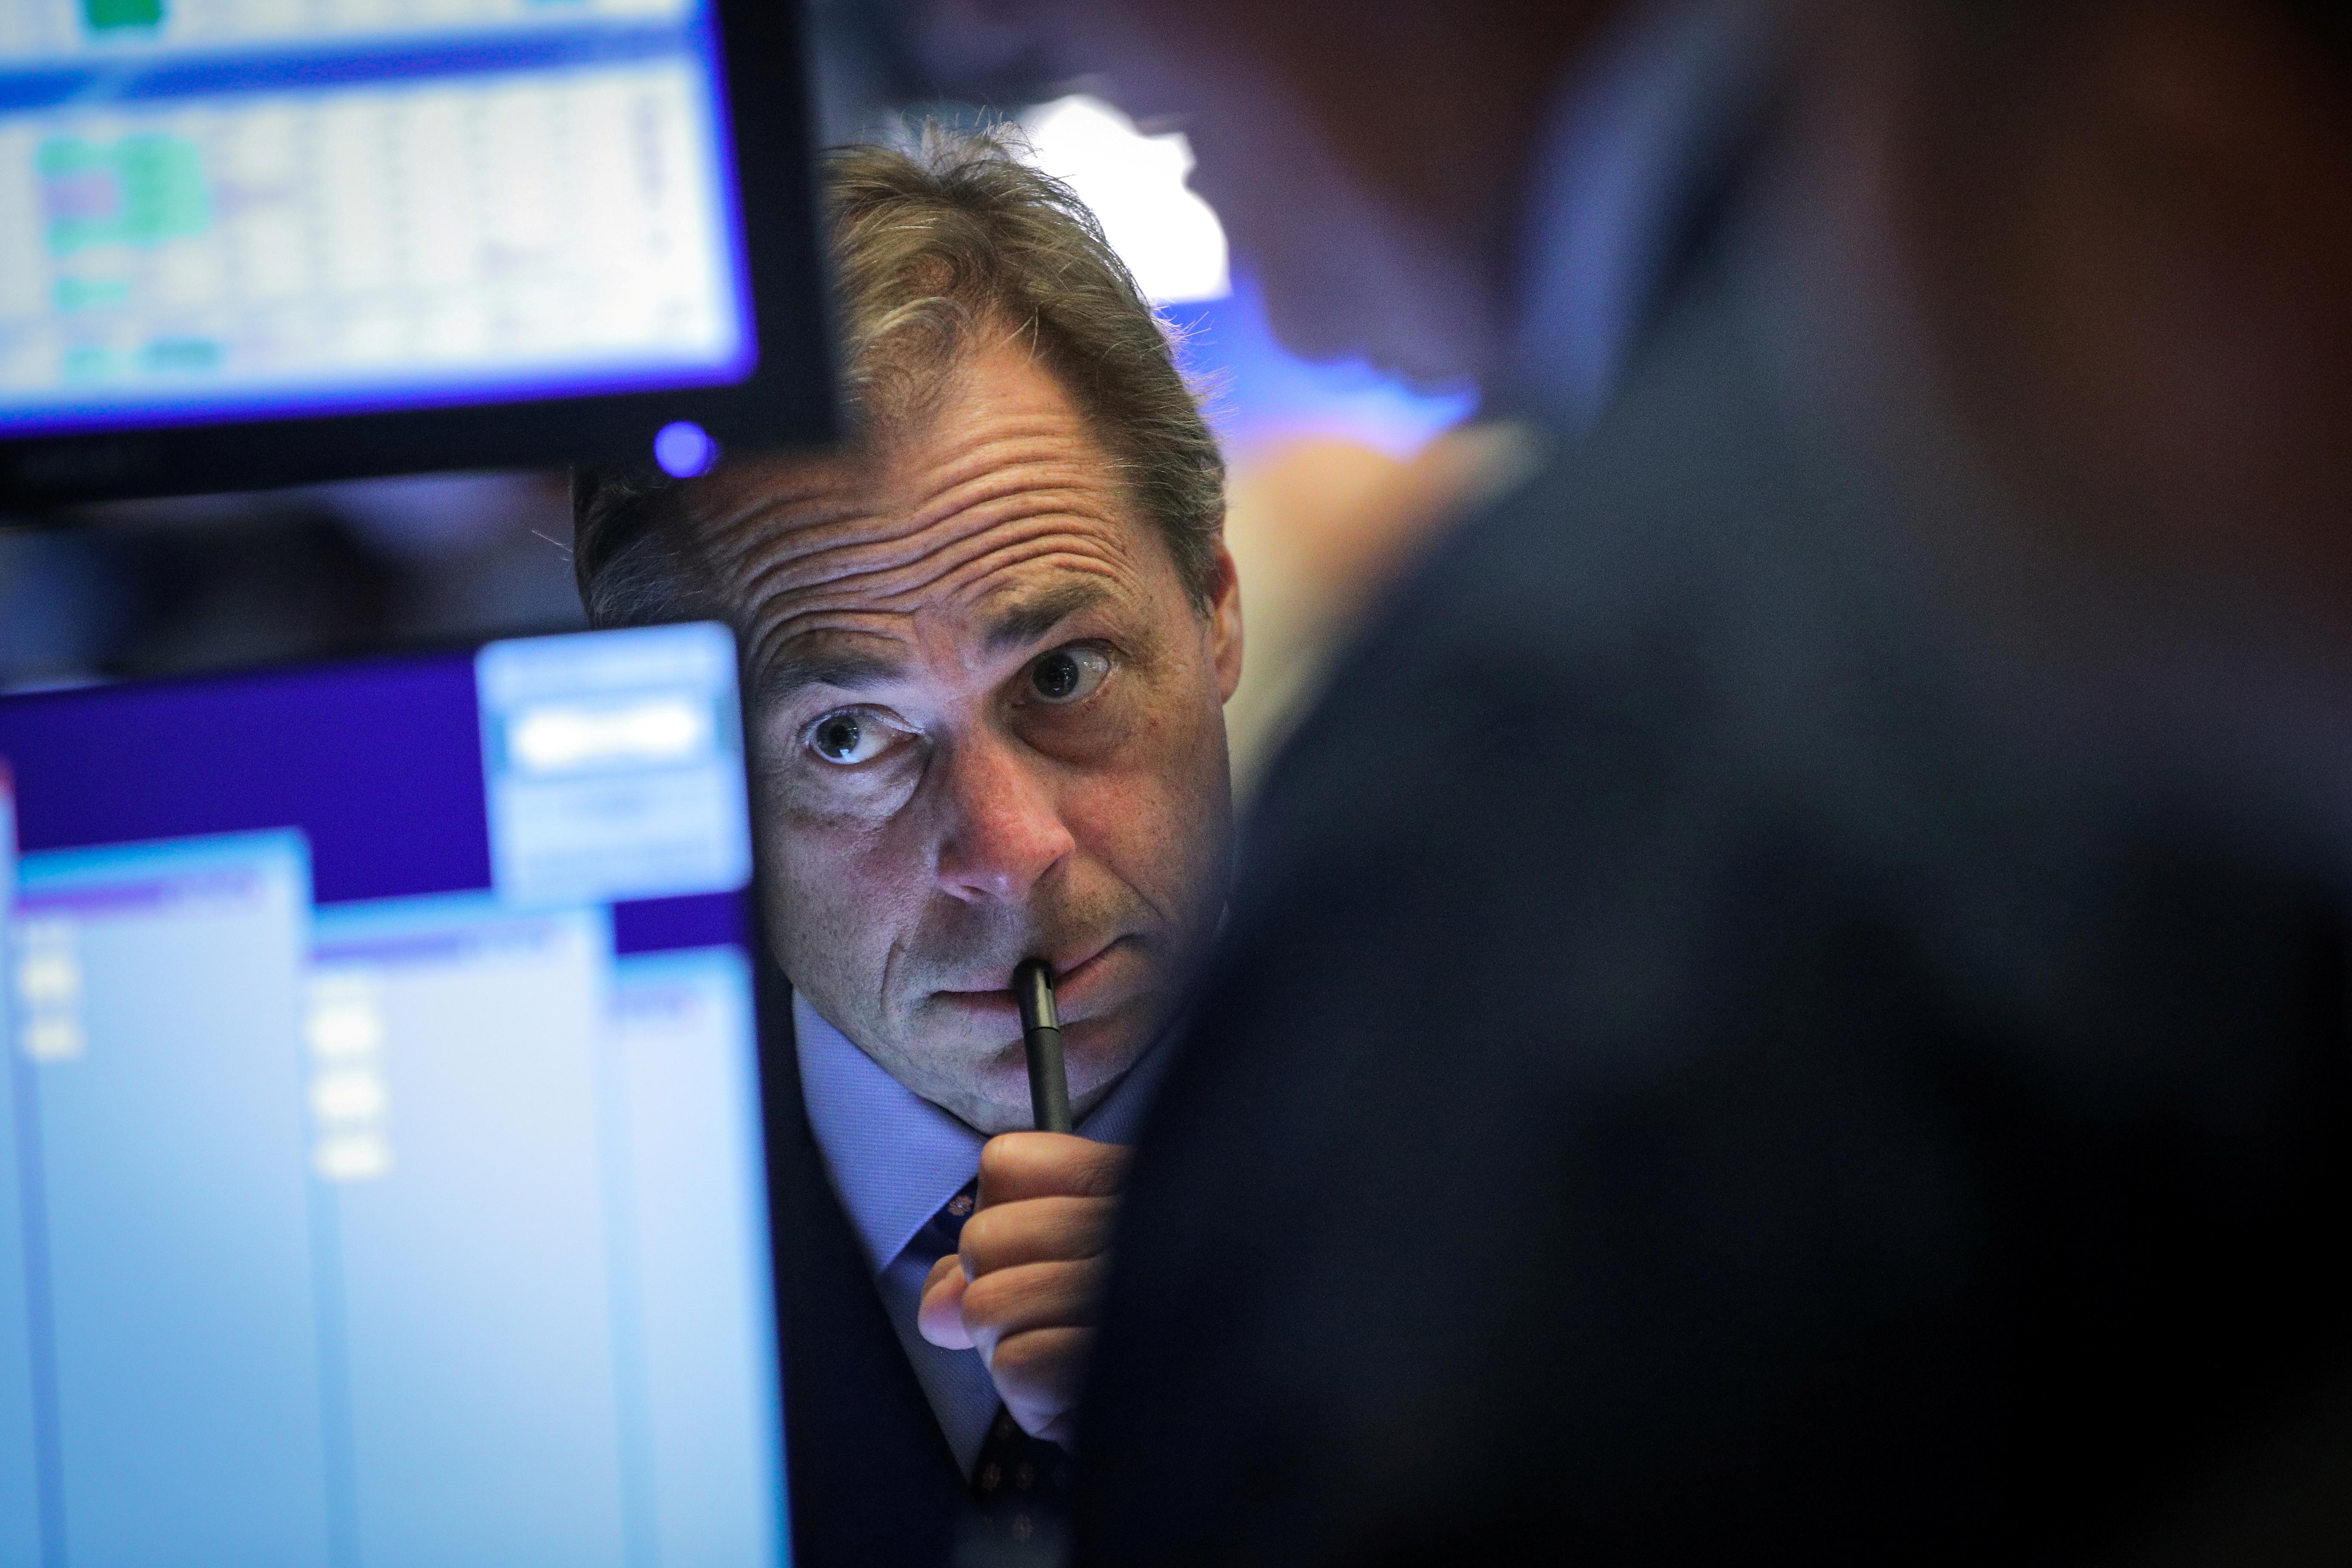 Global stocks fueled by hopes on monetary policy, U.S.-China trade